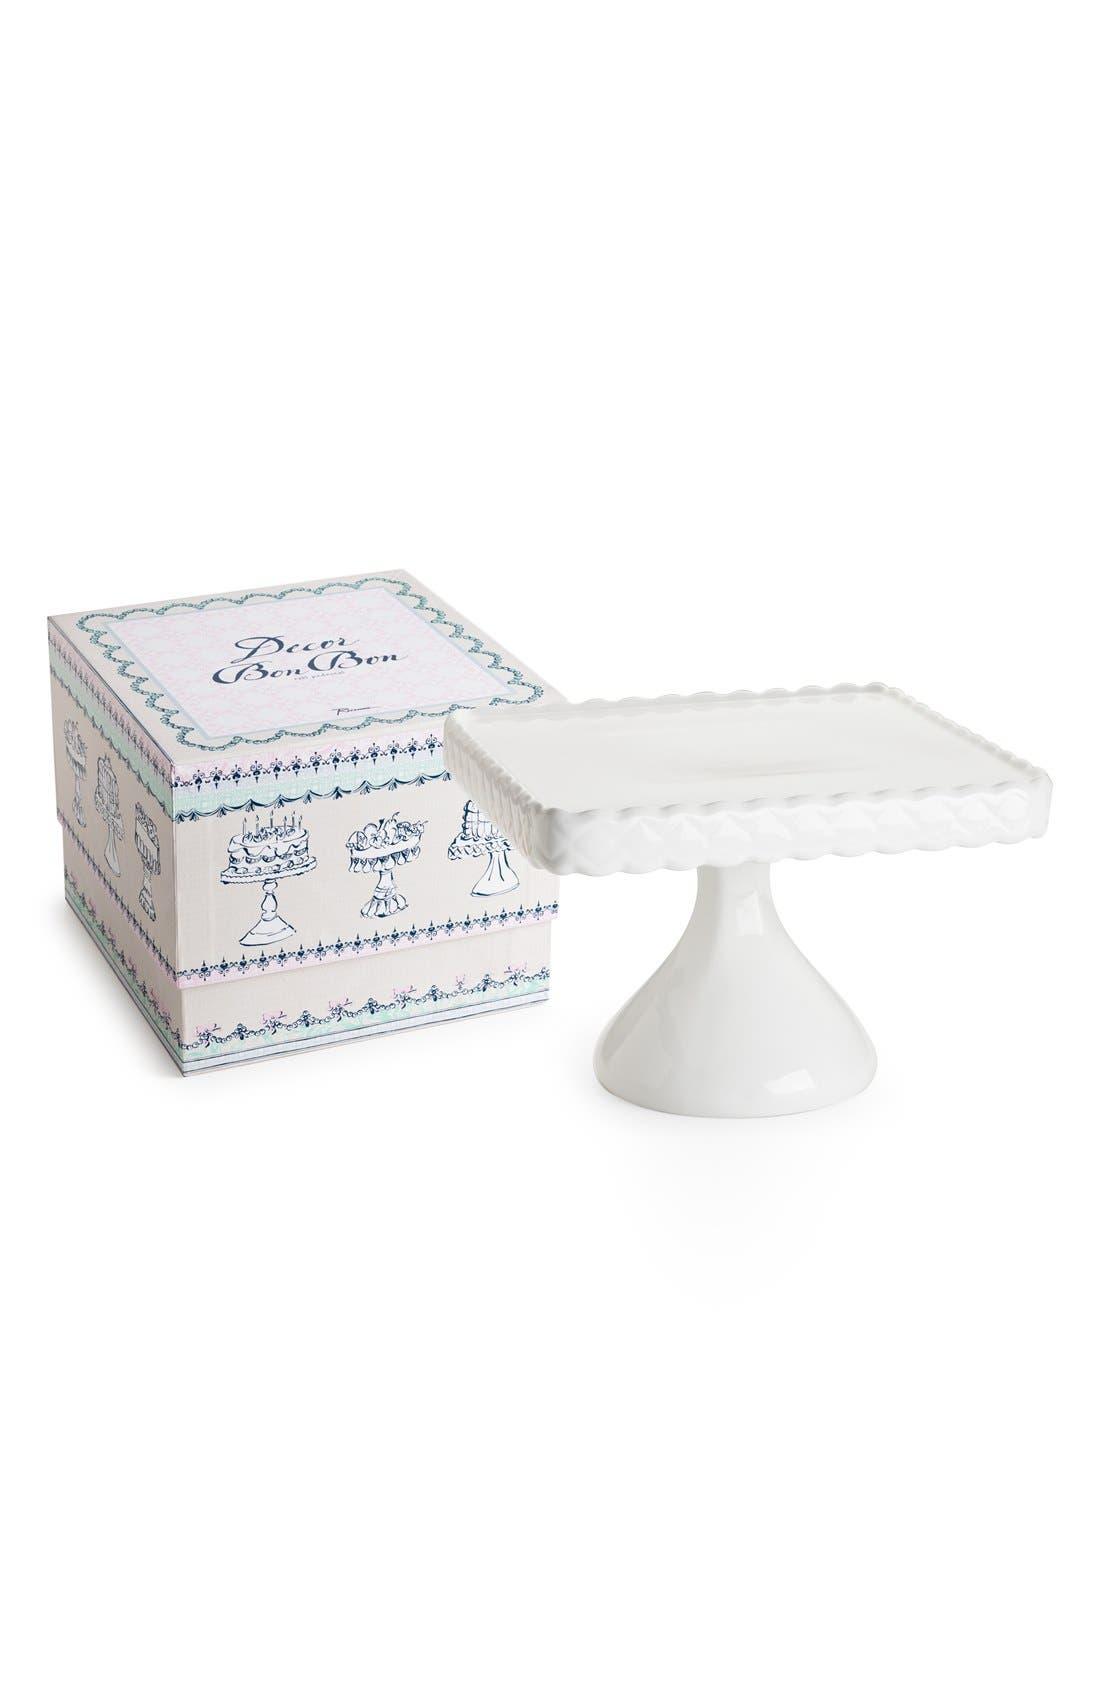 Rosanna 'Décor Bon Bon' Footed Square Cake Stand Pedestal